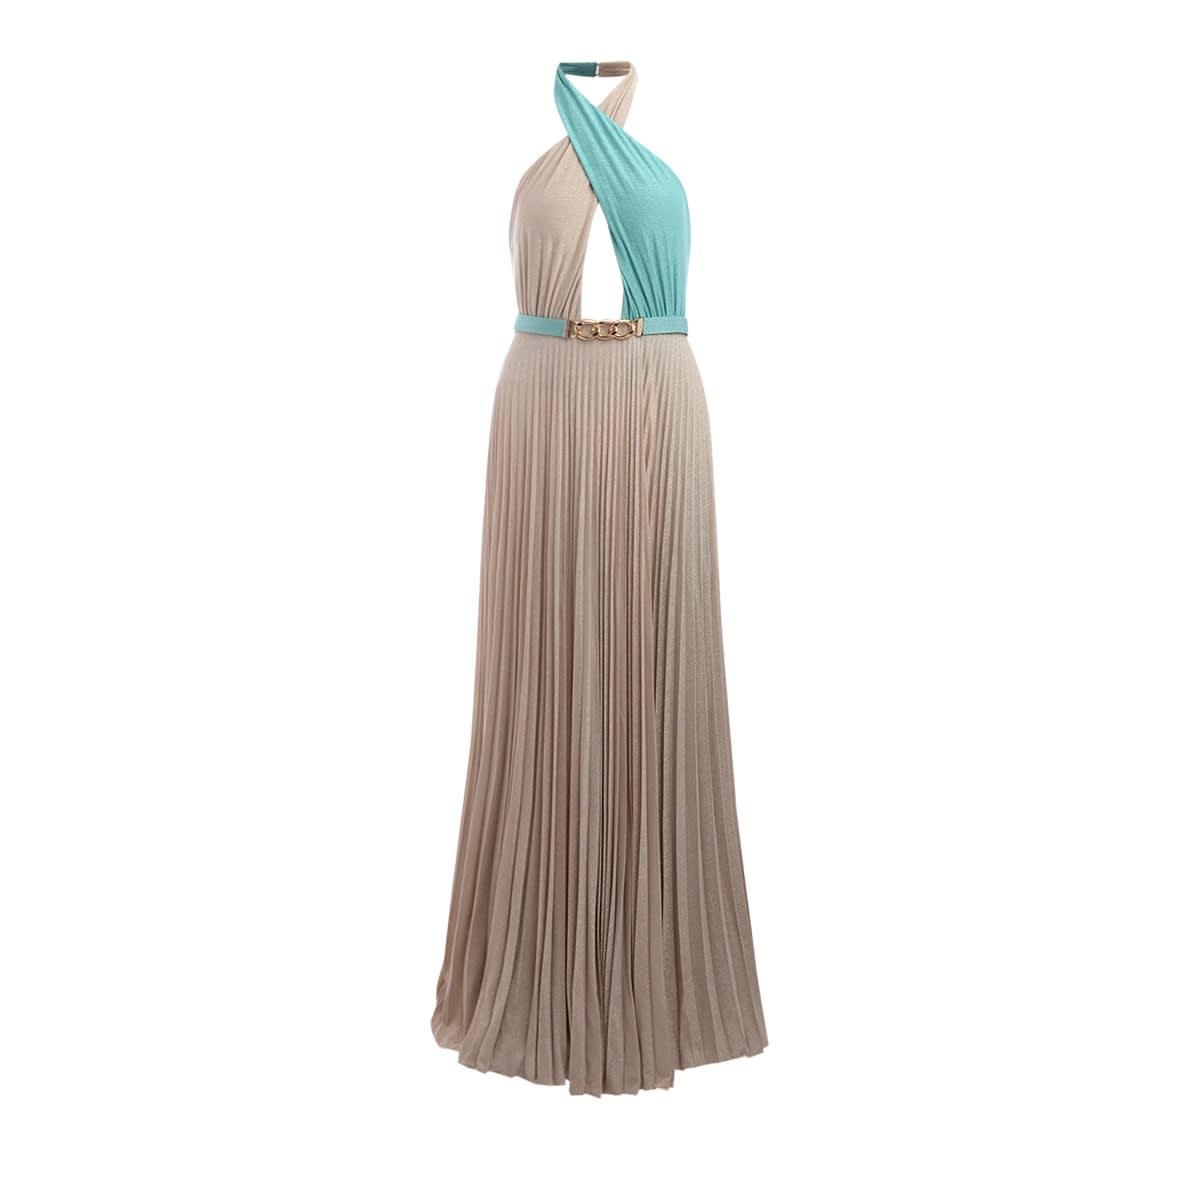 Buy Elisabetta Franchi Maxi Dress With Two-tone Crossed Neckline online, shop Elisabetta Franchi Celyn B. with free shipping